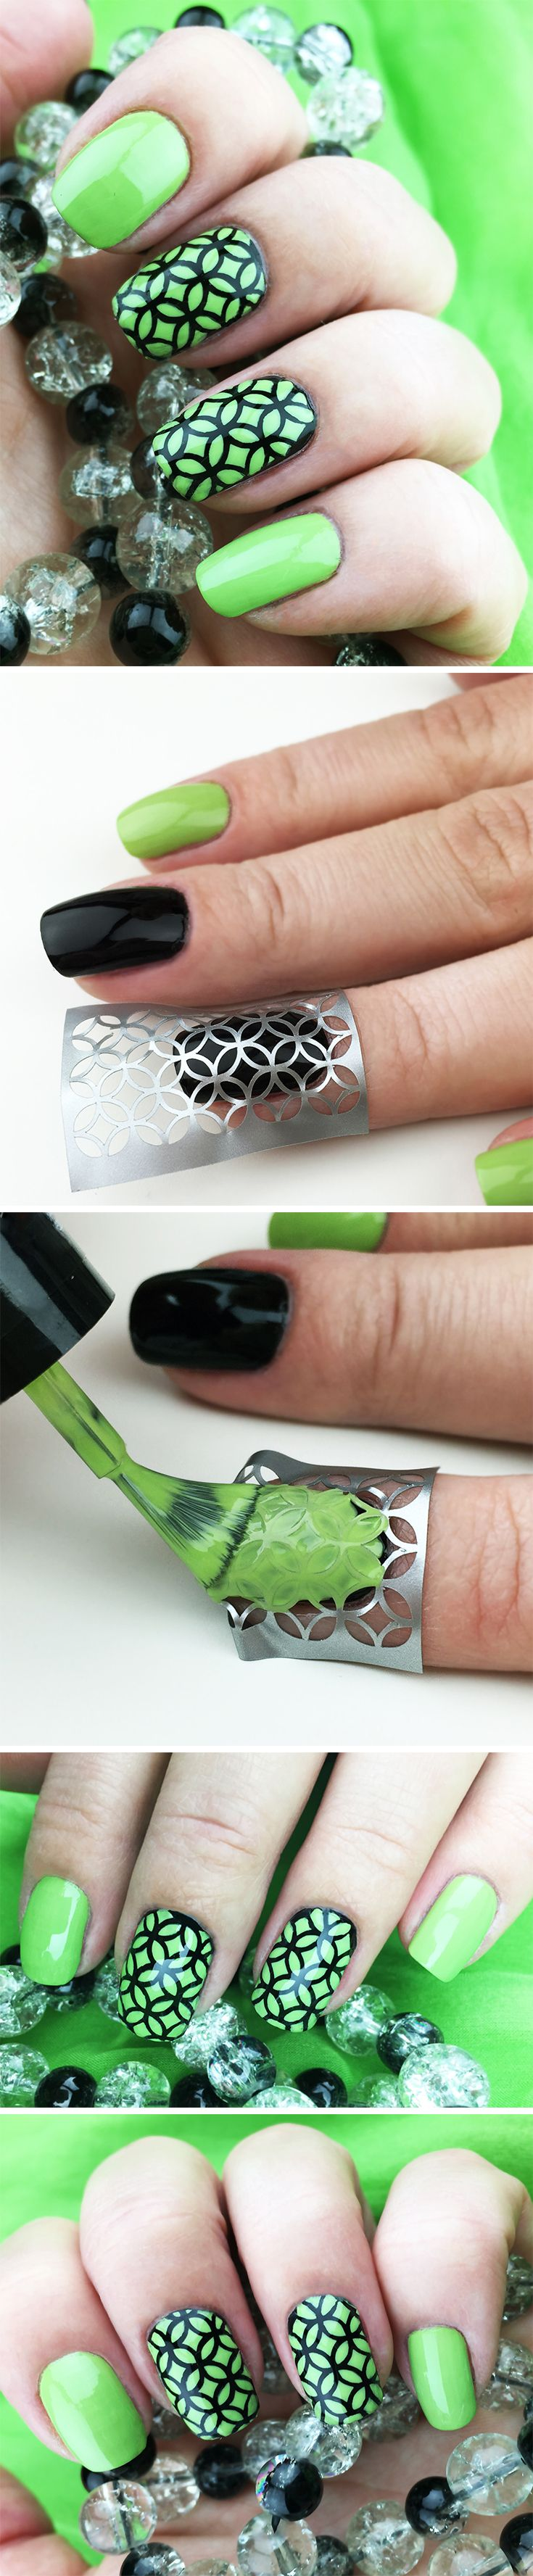 Tangerine Nail Art Stencils - incredible nail art vinyls by Unail ...